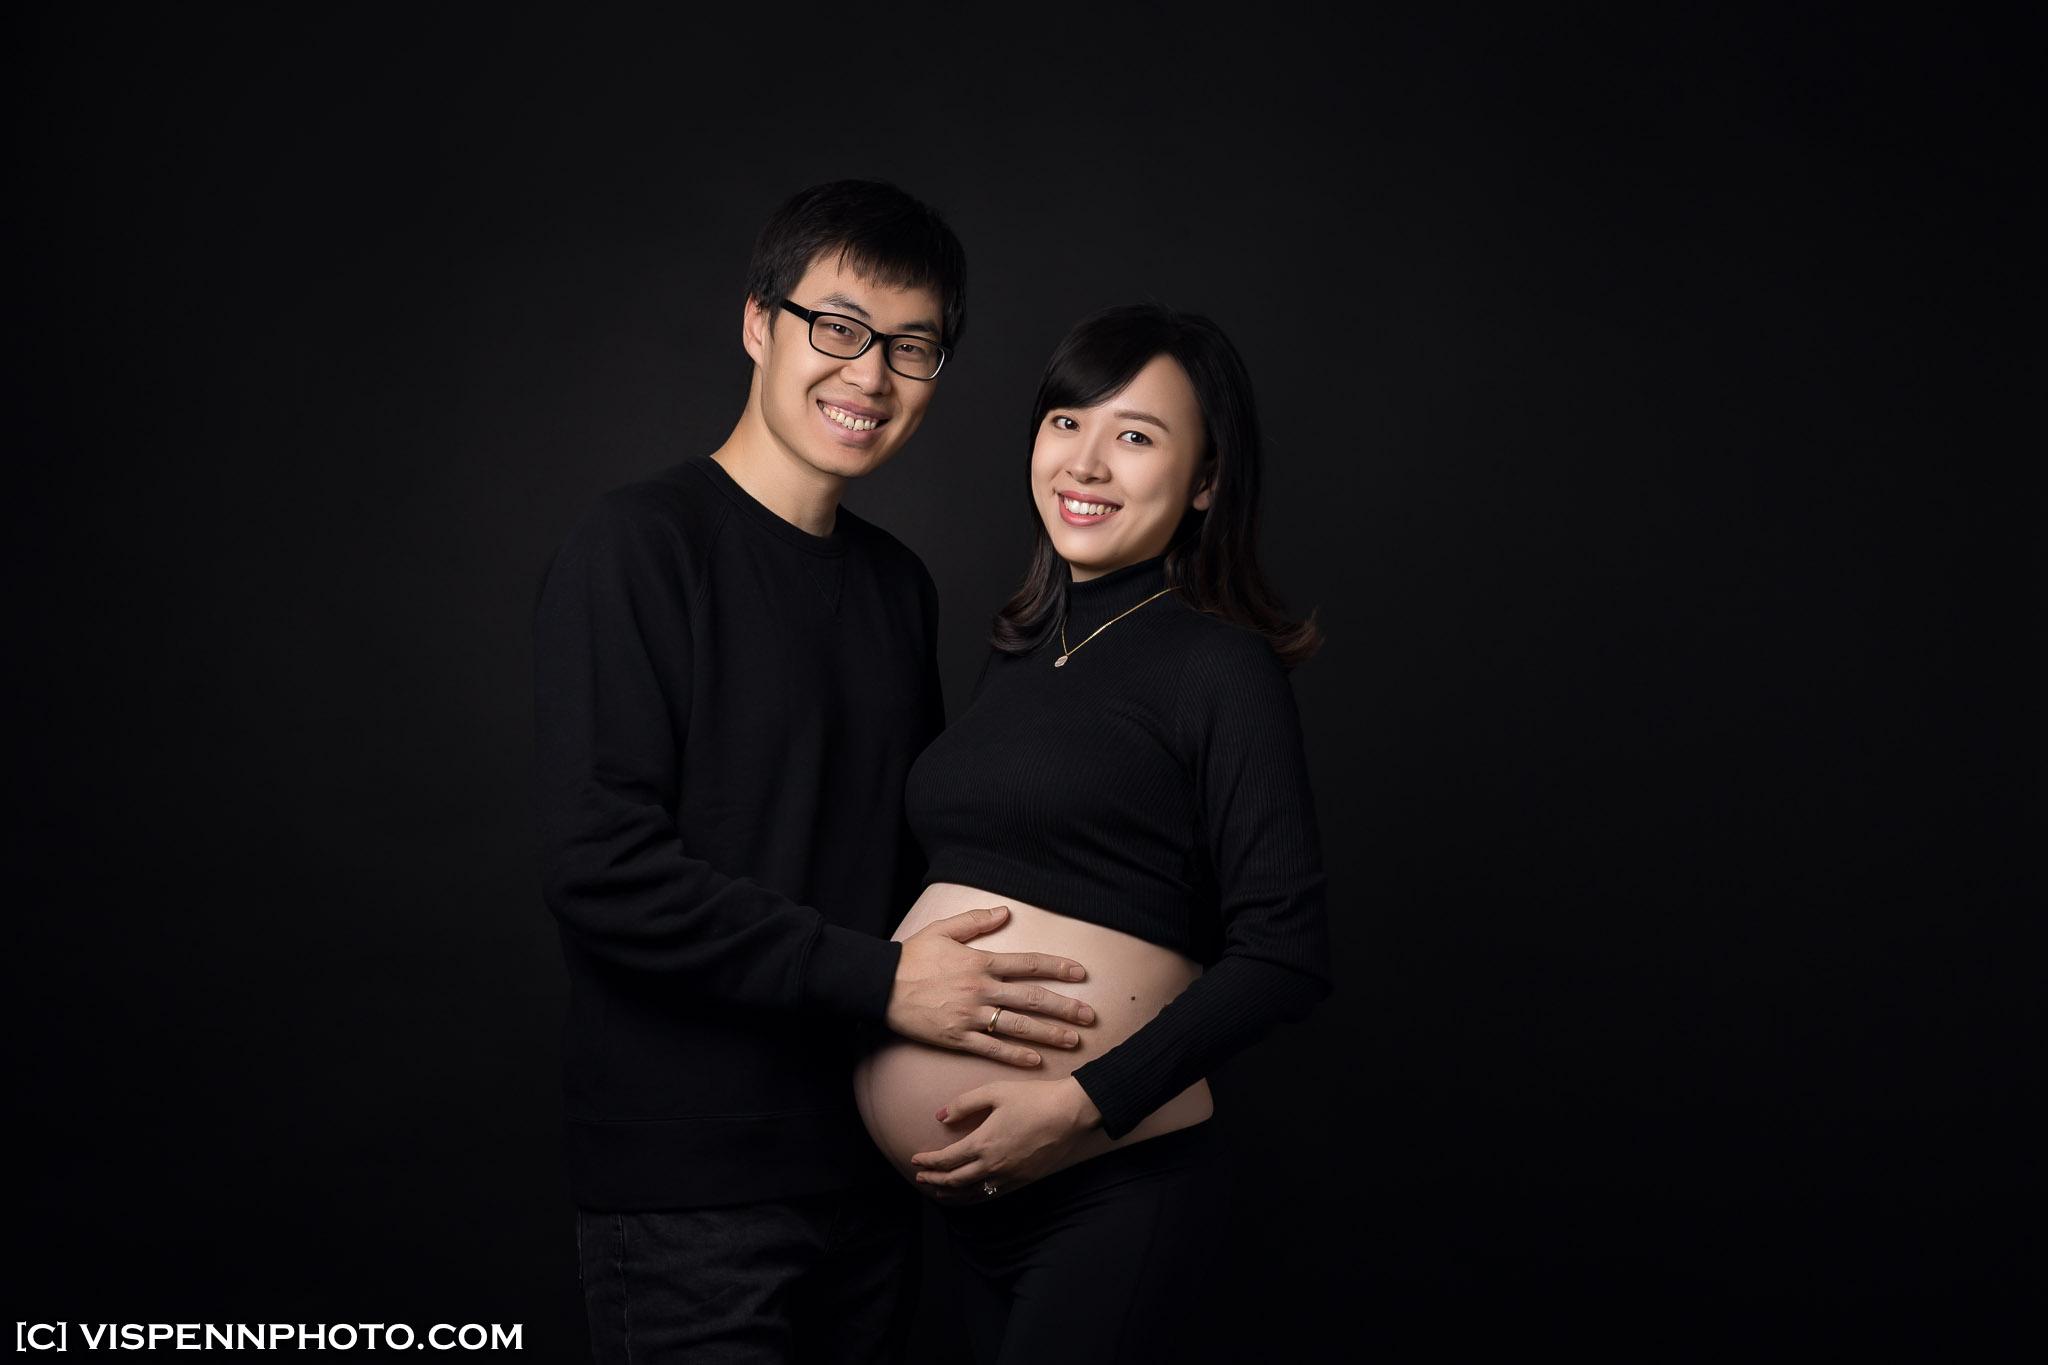 Melbourne Newborn Baby Maternity Family Photo VISPENN 墨尔本 孕妇照 大肚照 QinLIU 1283 VISPENN